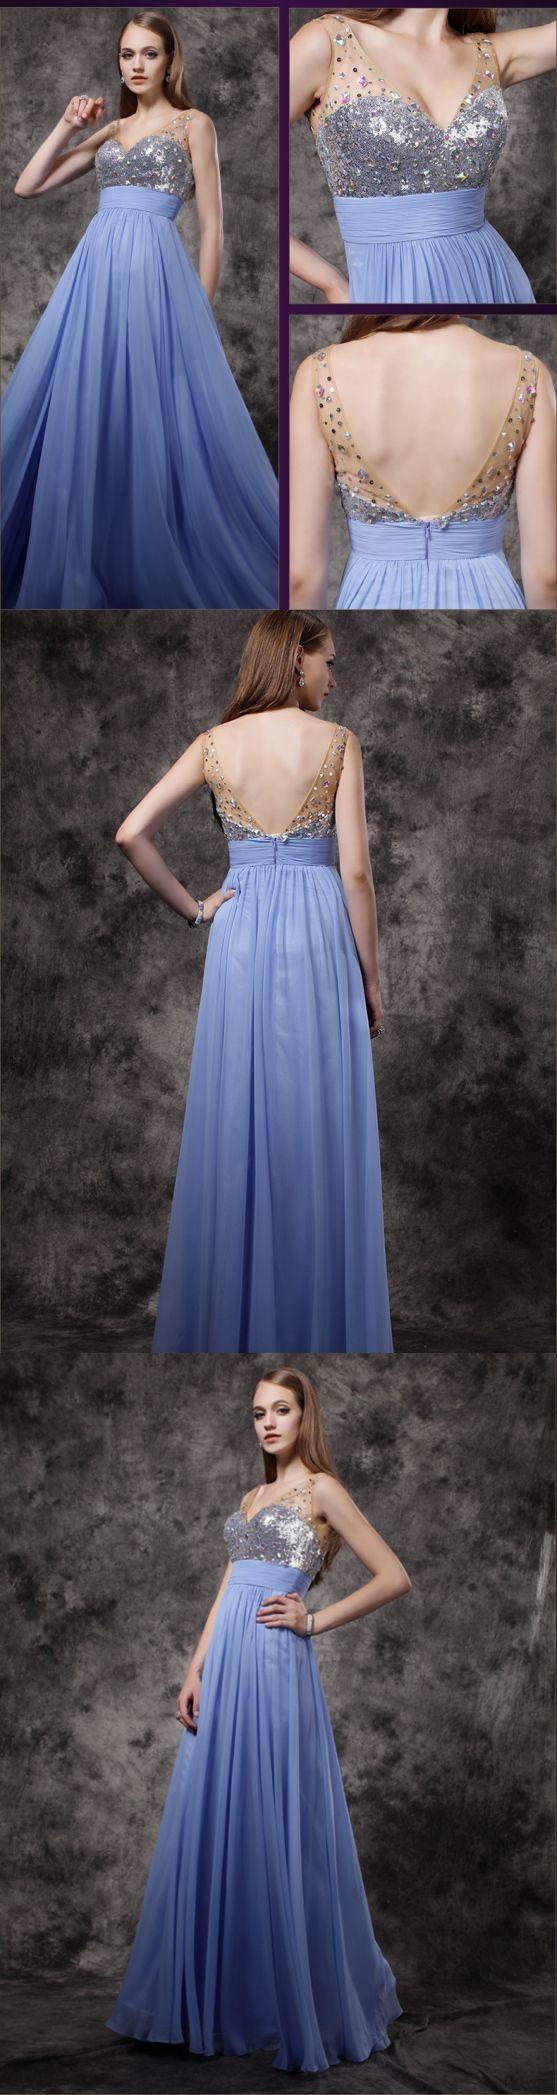 Prom Dress Simple Chiffon A-line Cheap Long Prom Dress